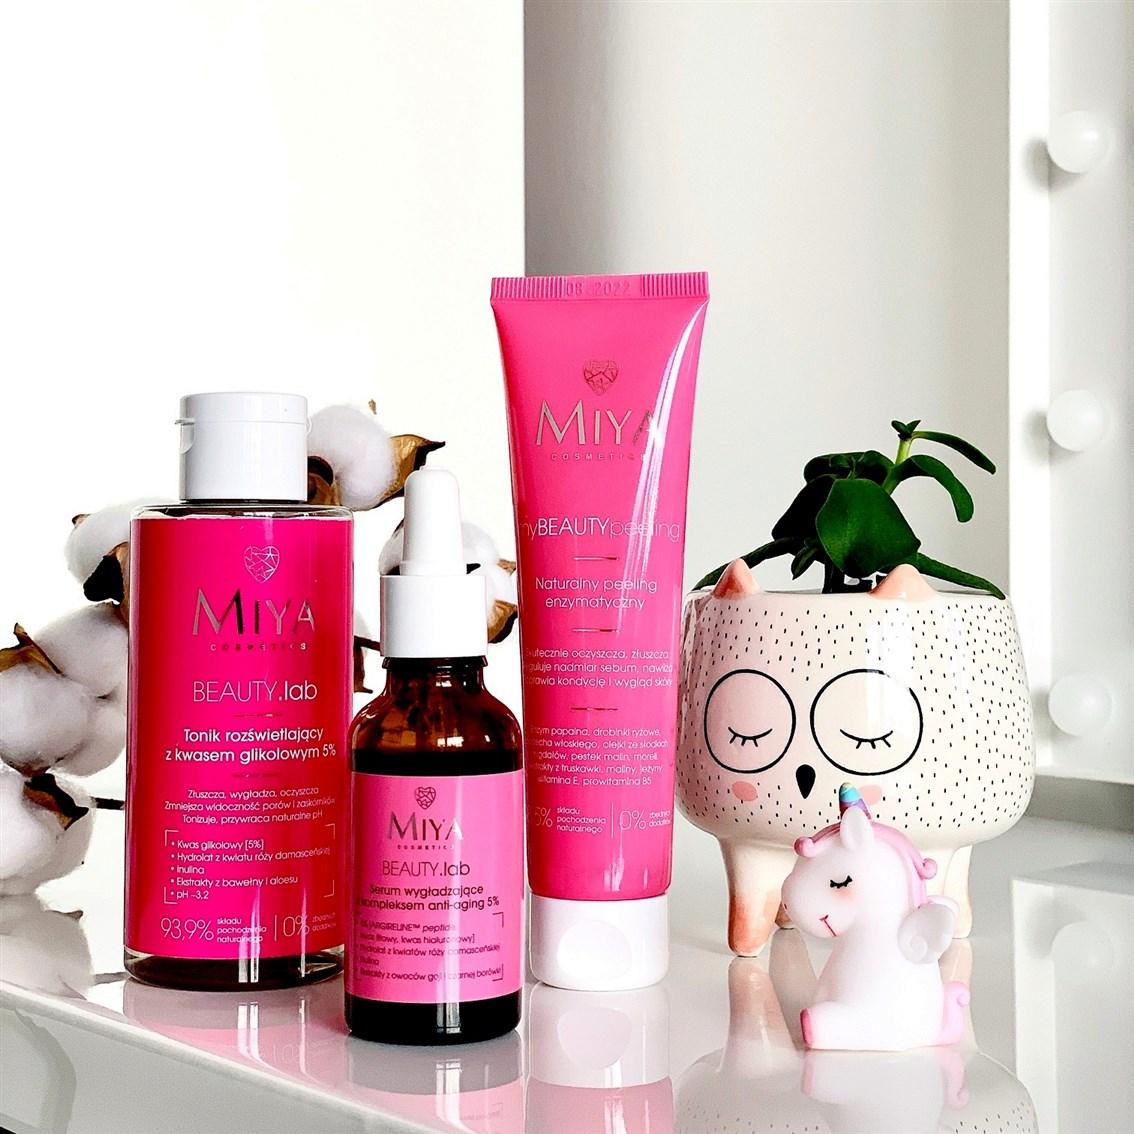 miya beauty lab blog